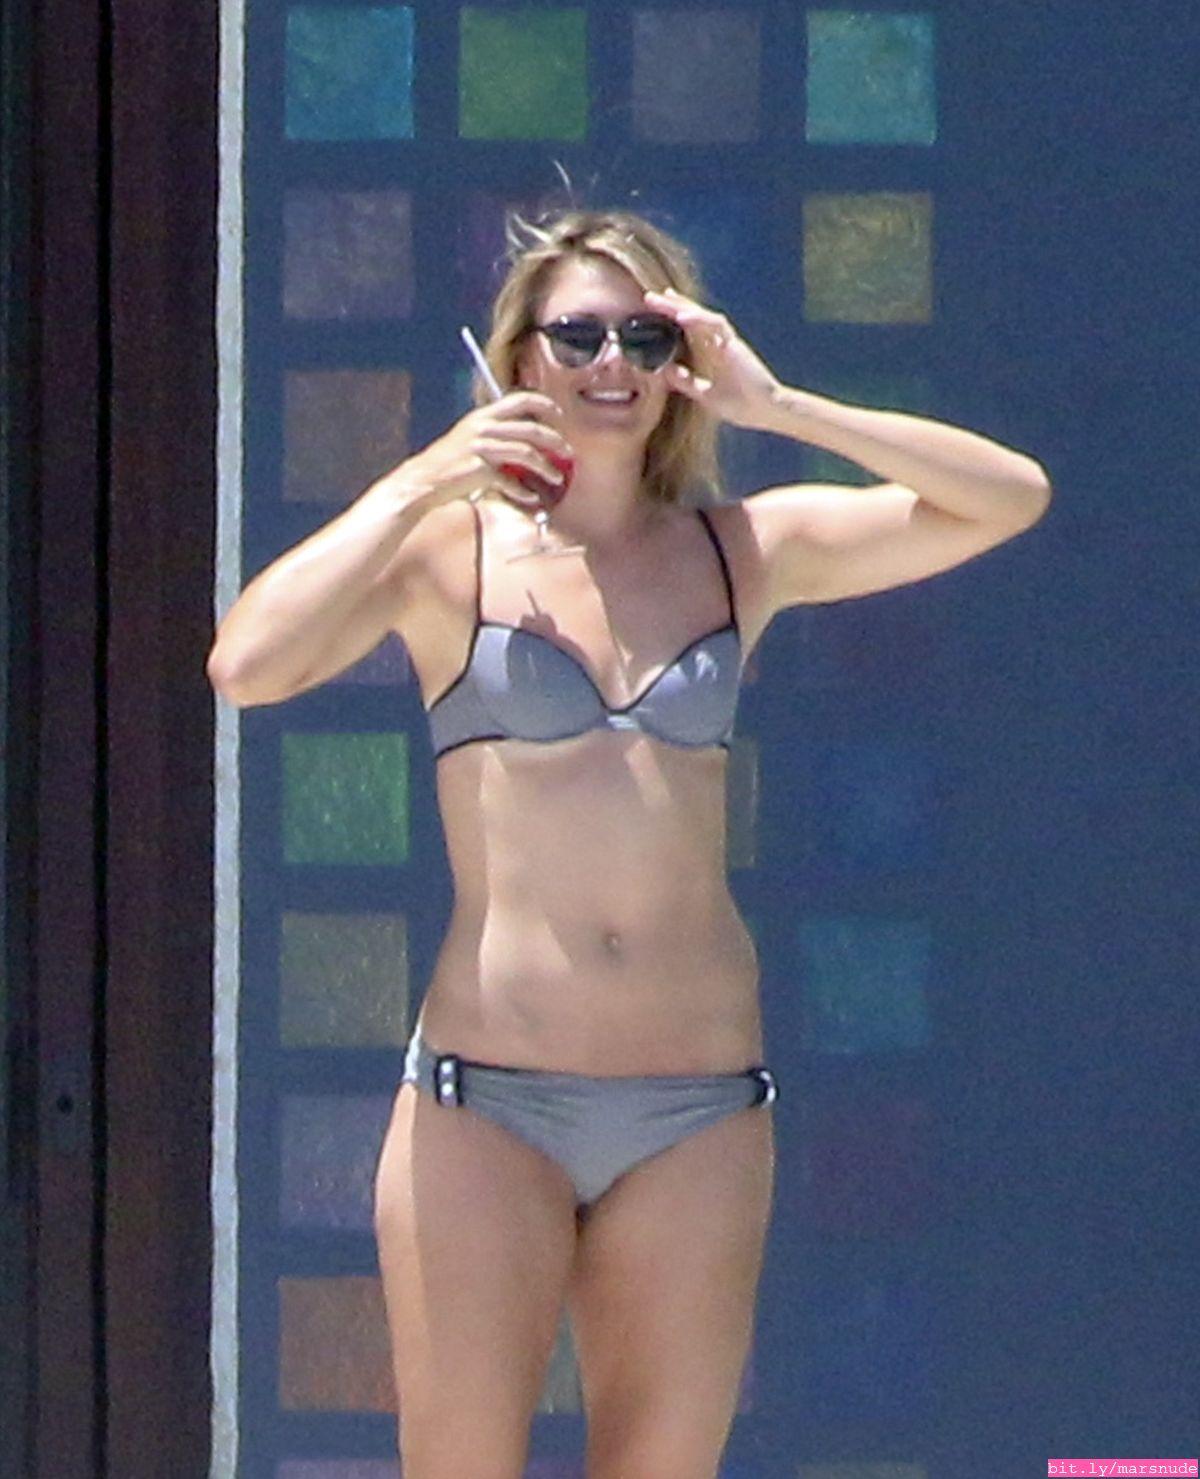 Maria Sharapova Nude - Youve Never Seen Her Like This